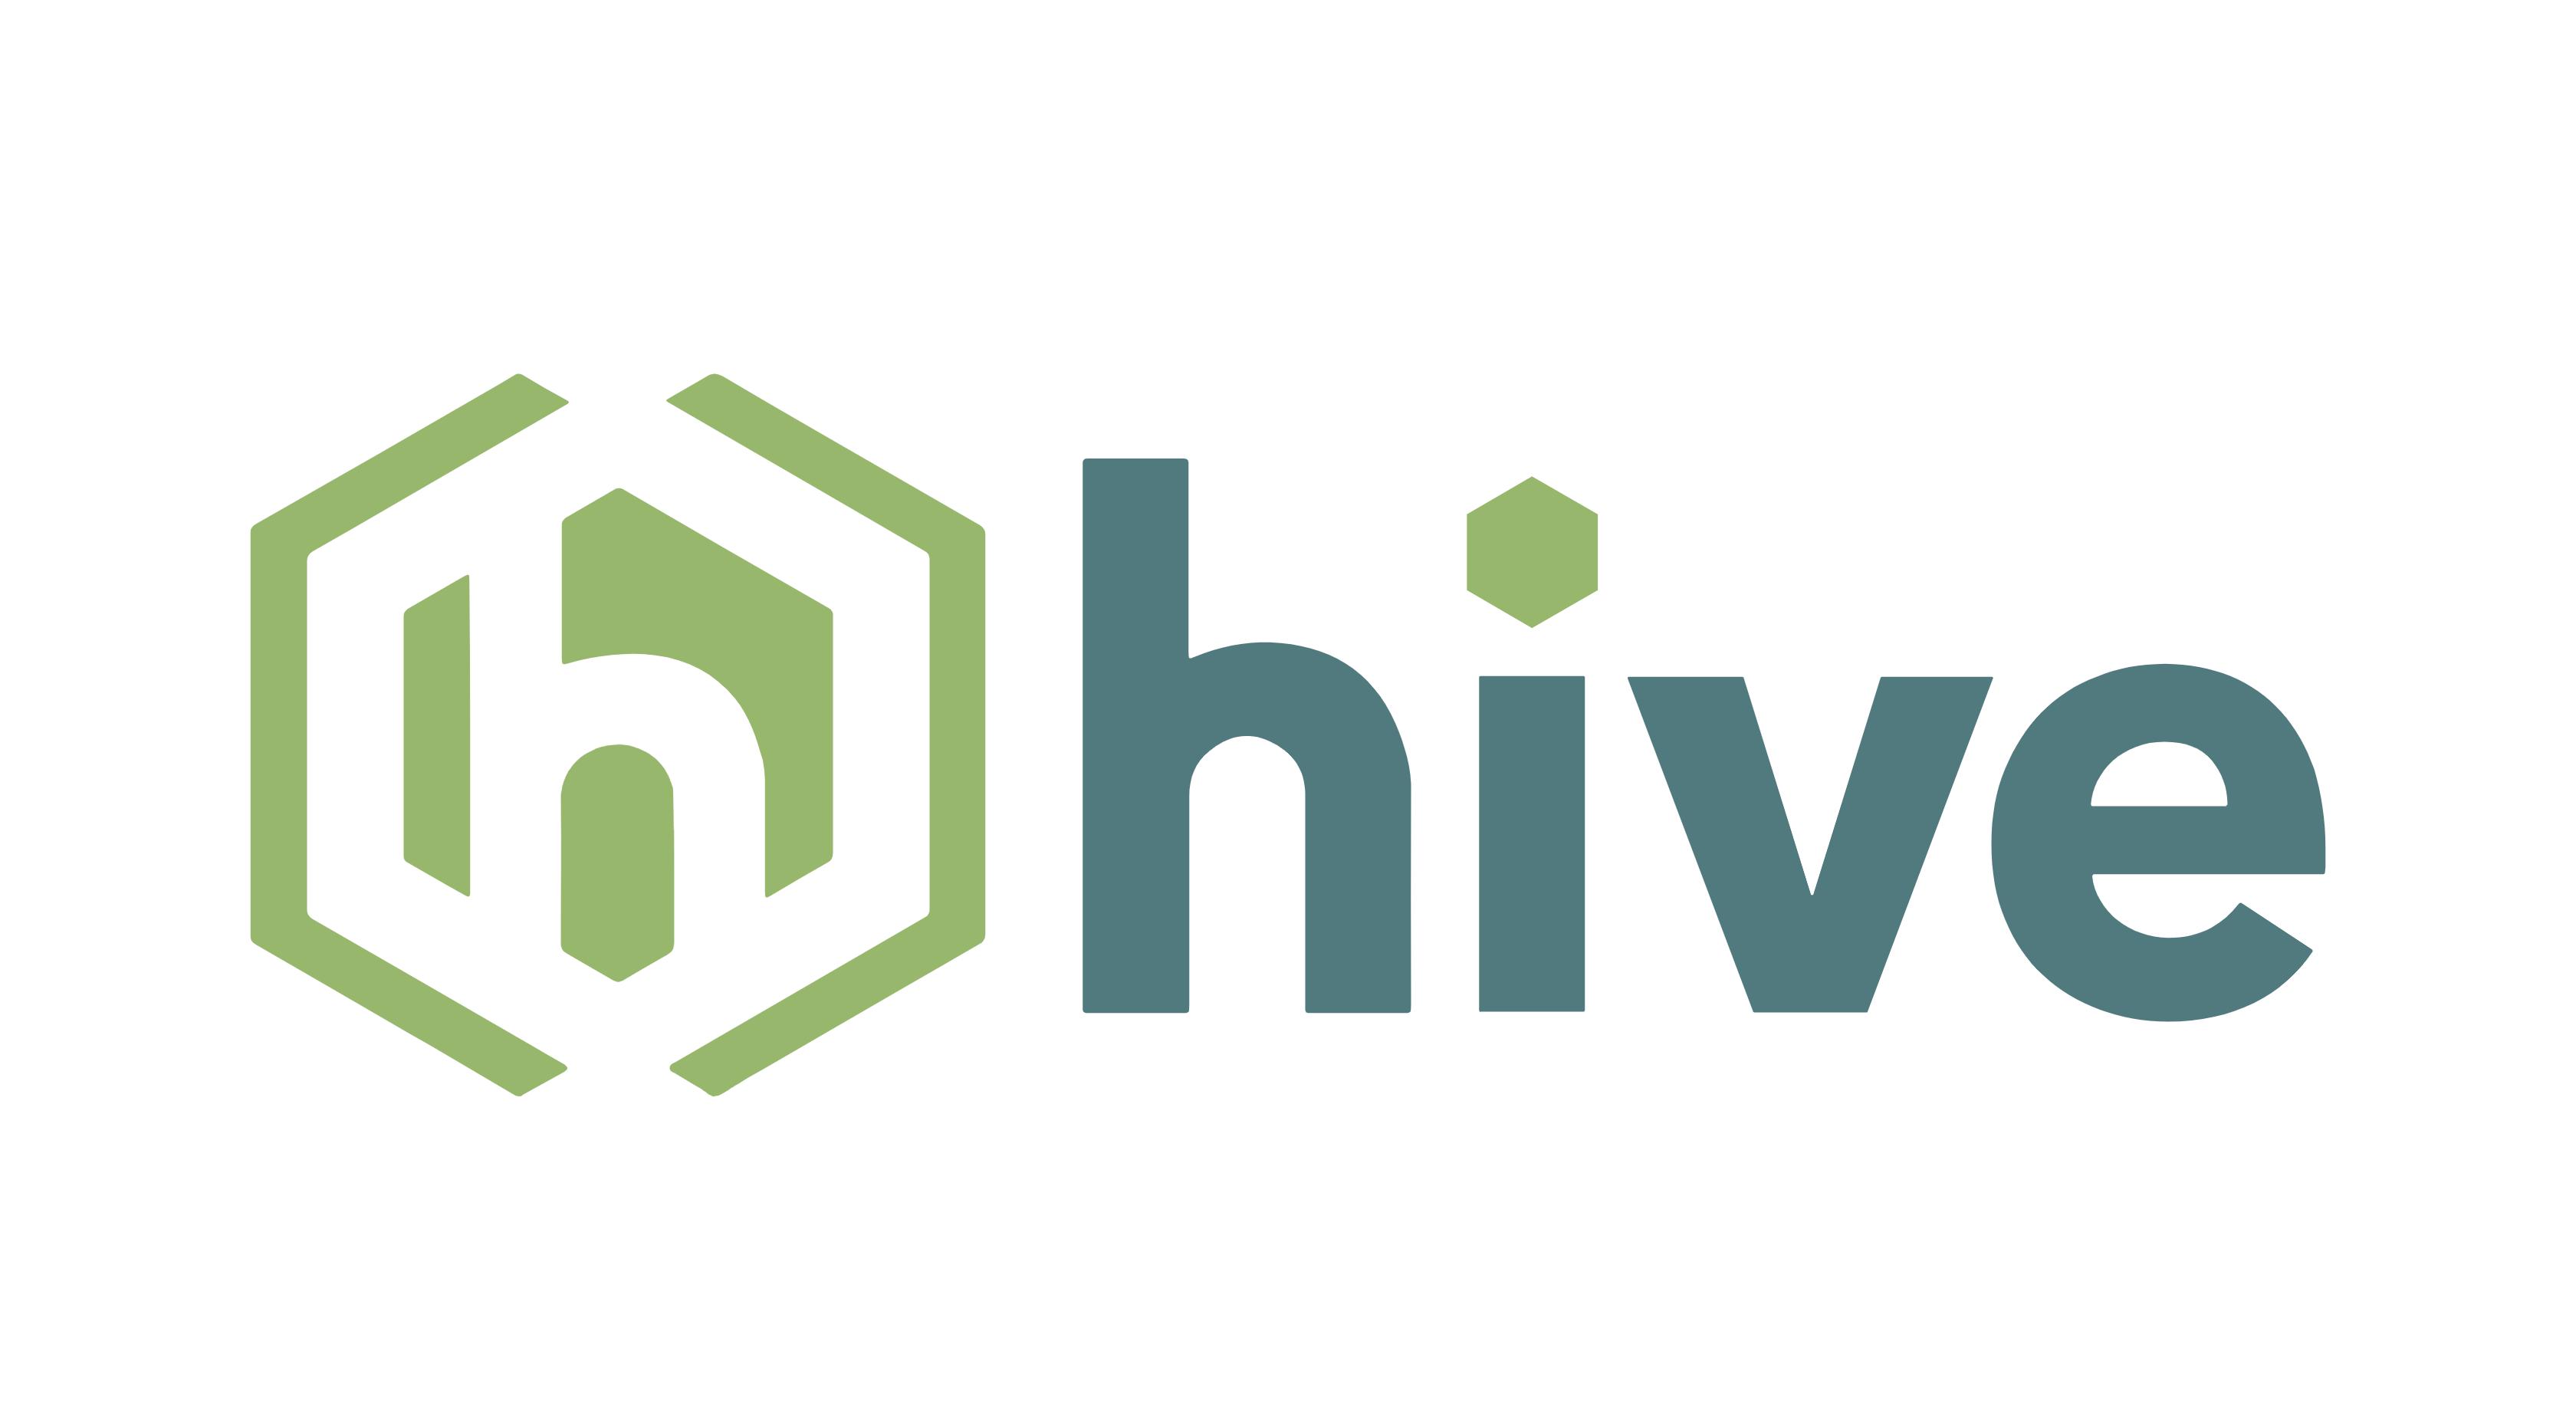 WV Hive